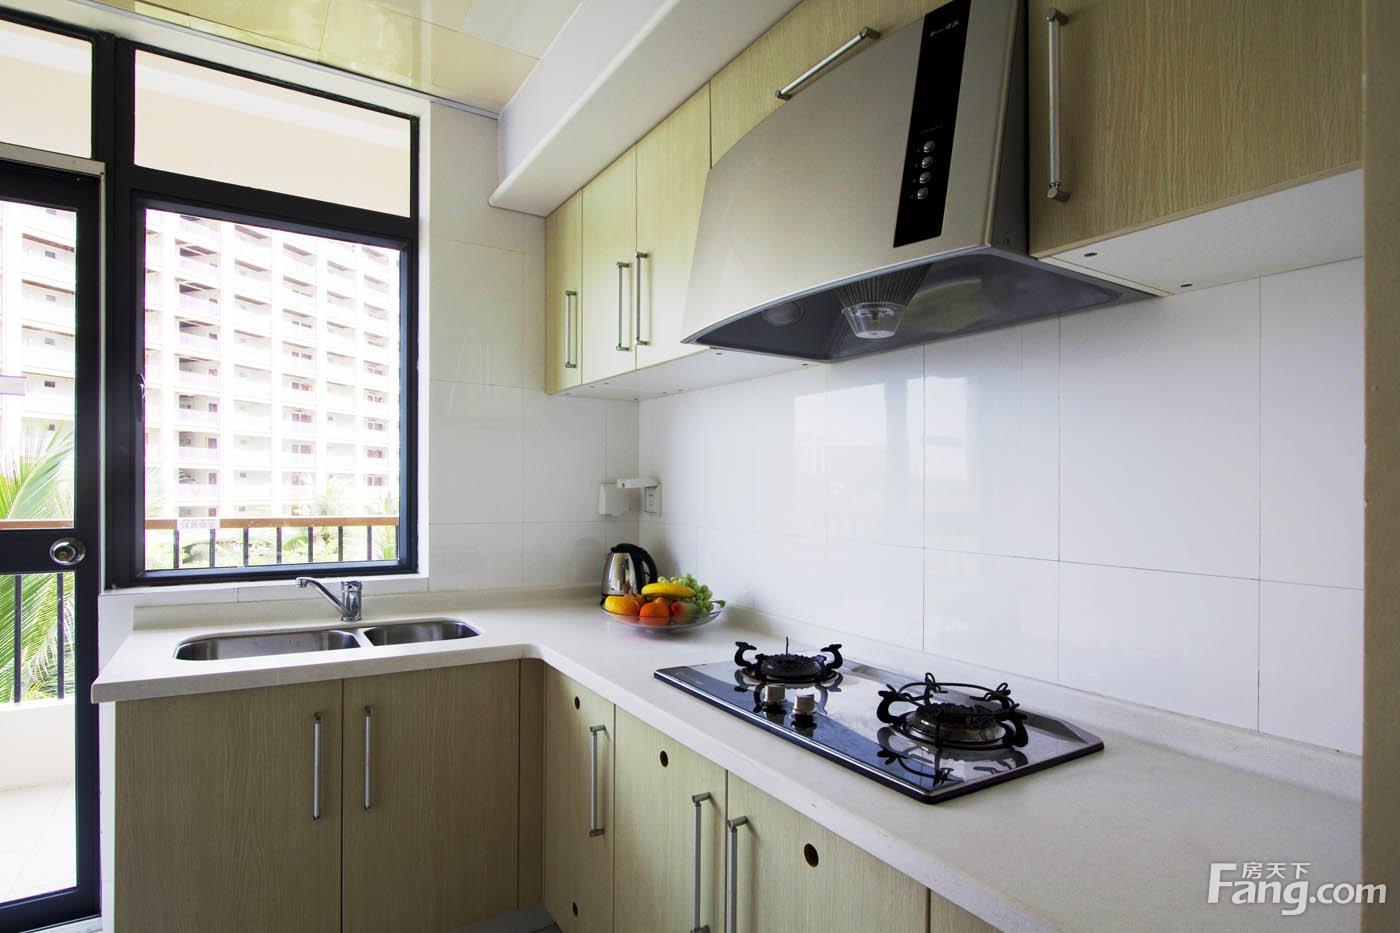 pictures for kitchen wall top mount sink 如何选择厨房墙面玻璃厨房墙面材料有哪些 家居知识 房天下家居装修